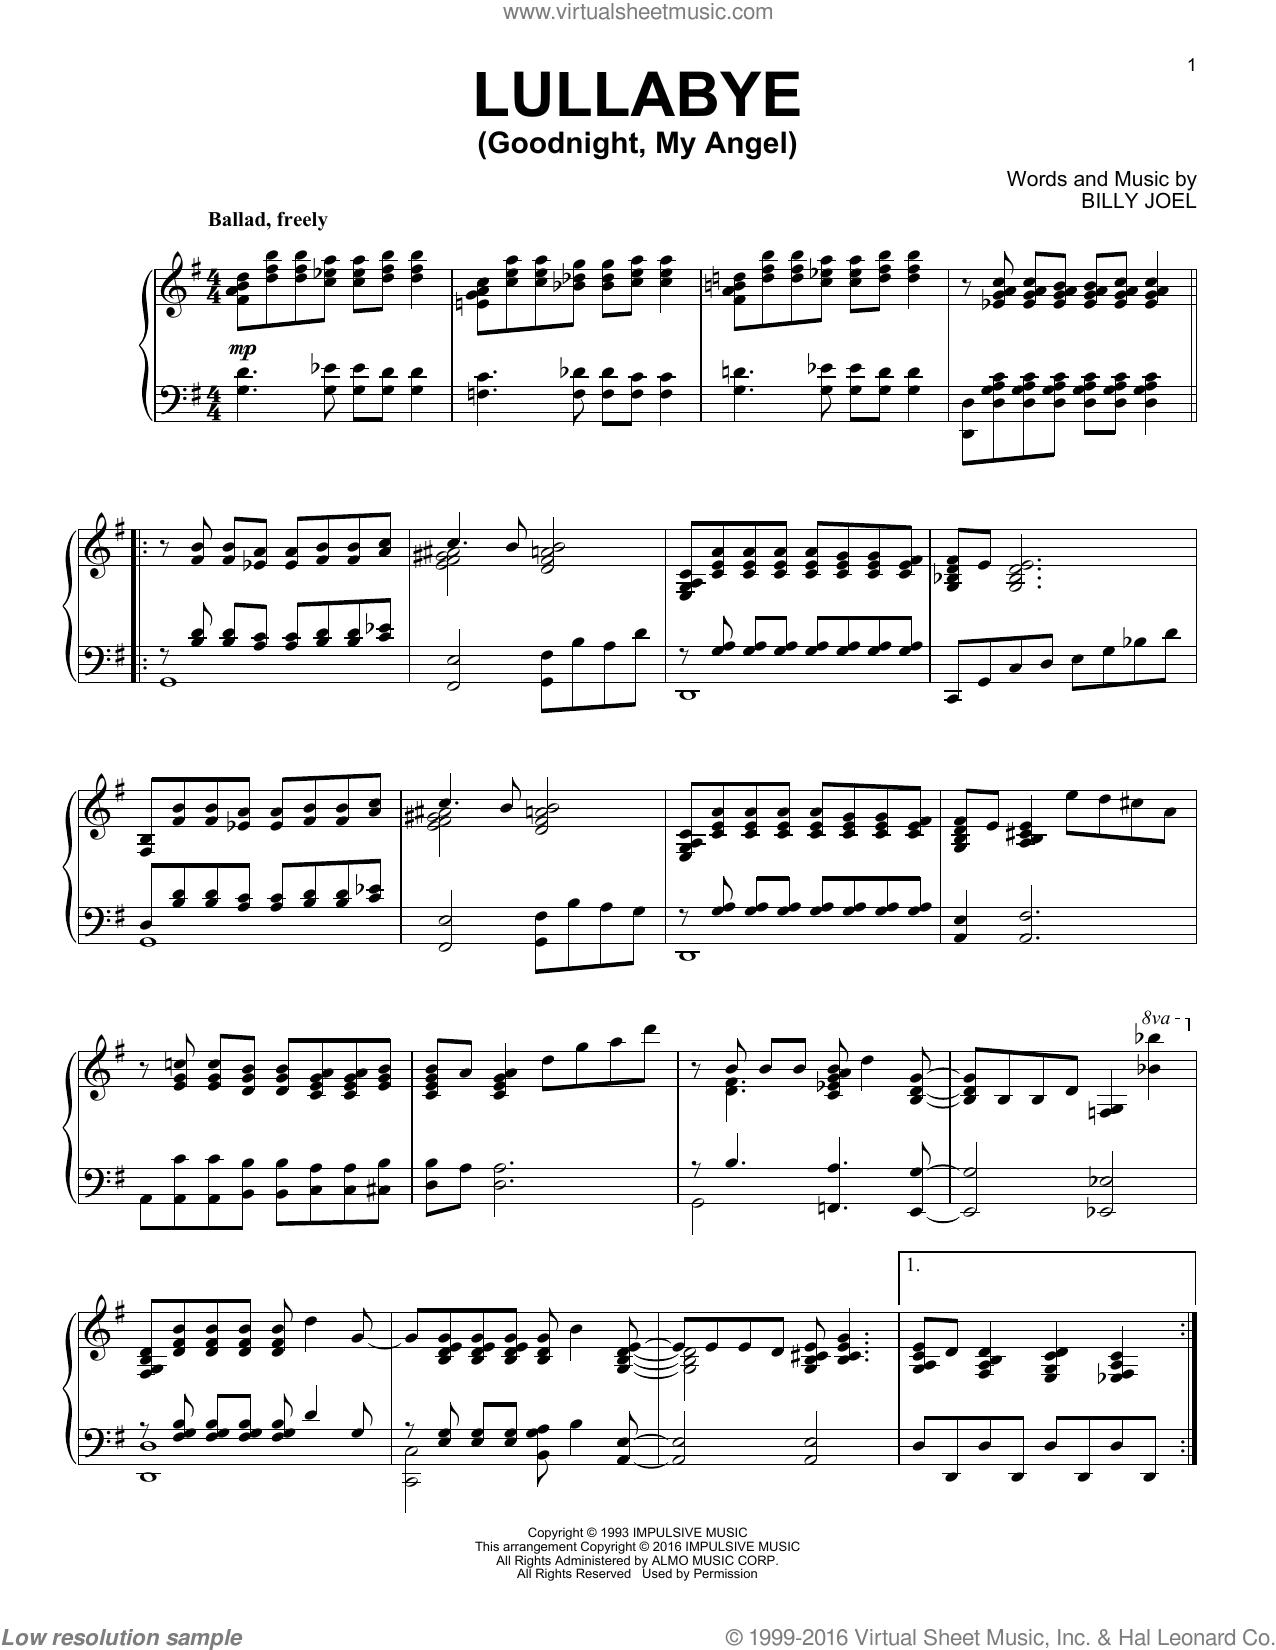 Billy Joel Lullaby Sheet Music : billy, lullaby, sheet, music, Music, Sheet, Partition, Free:, Billy, Lullaby